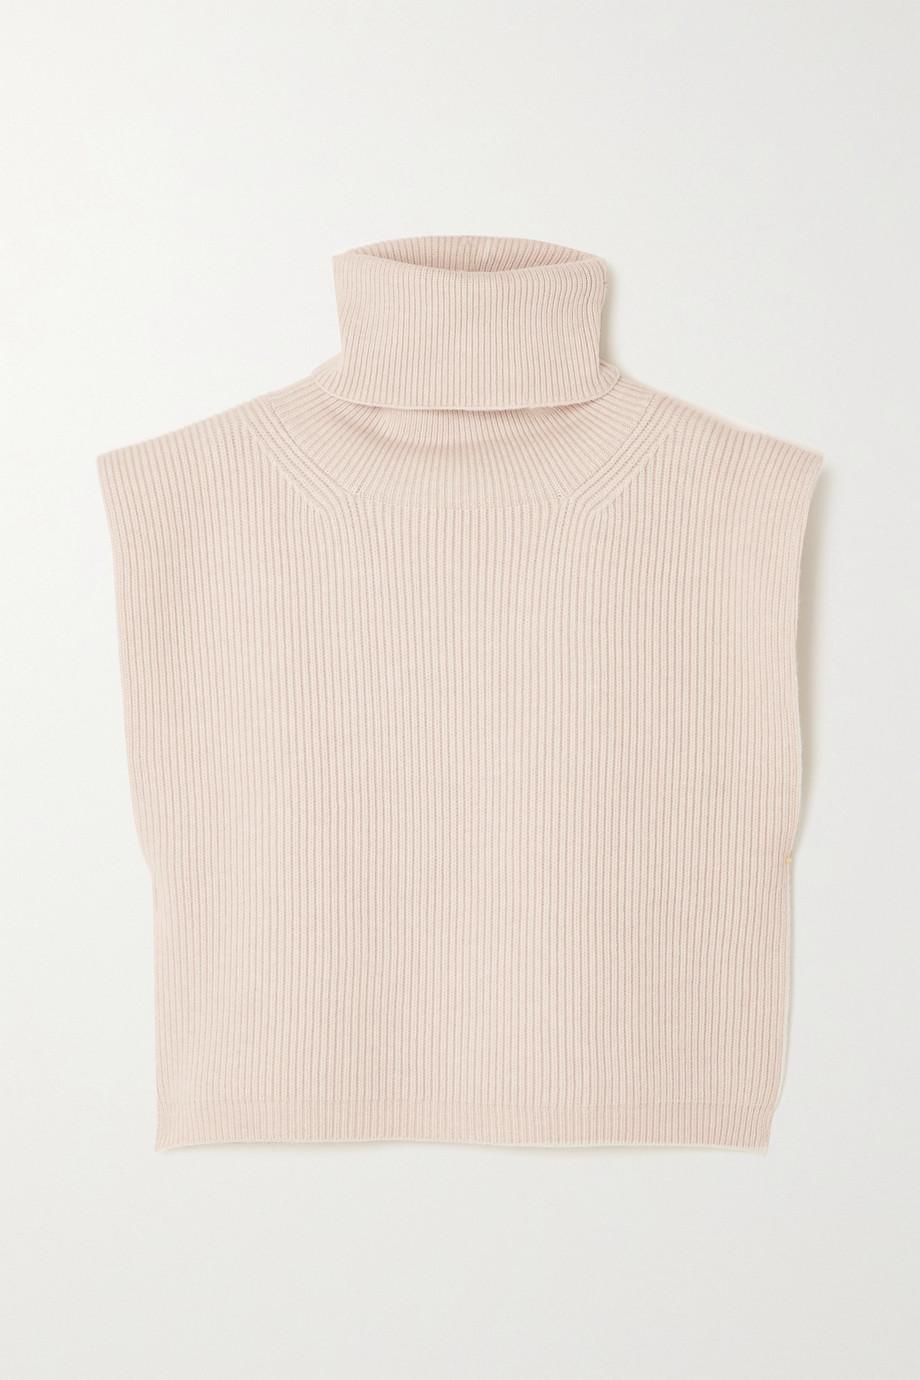 Totême Ribbed wool-blend turtleneck bib